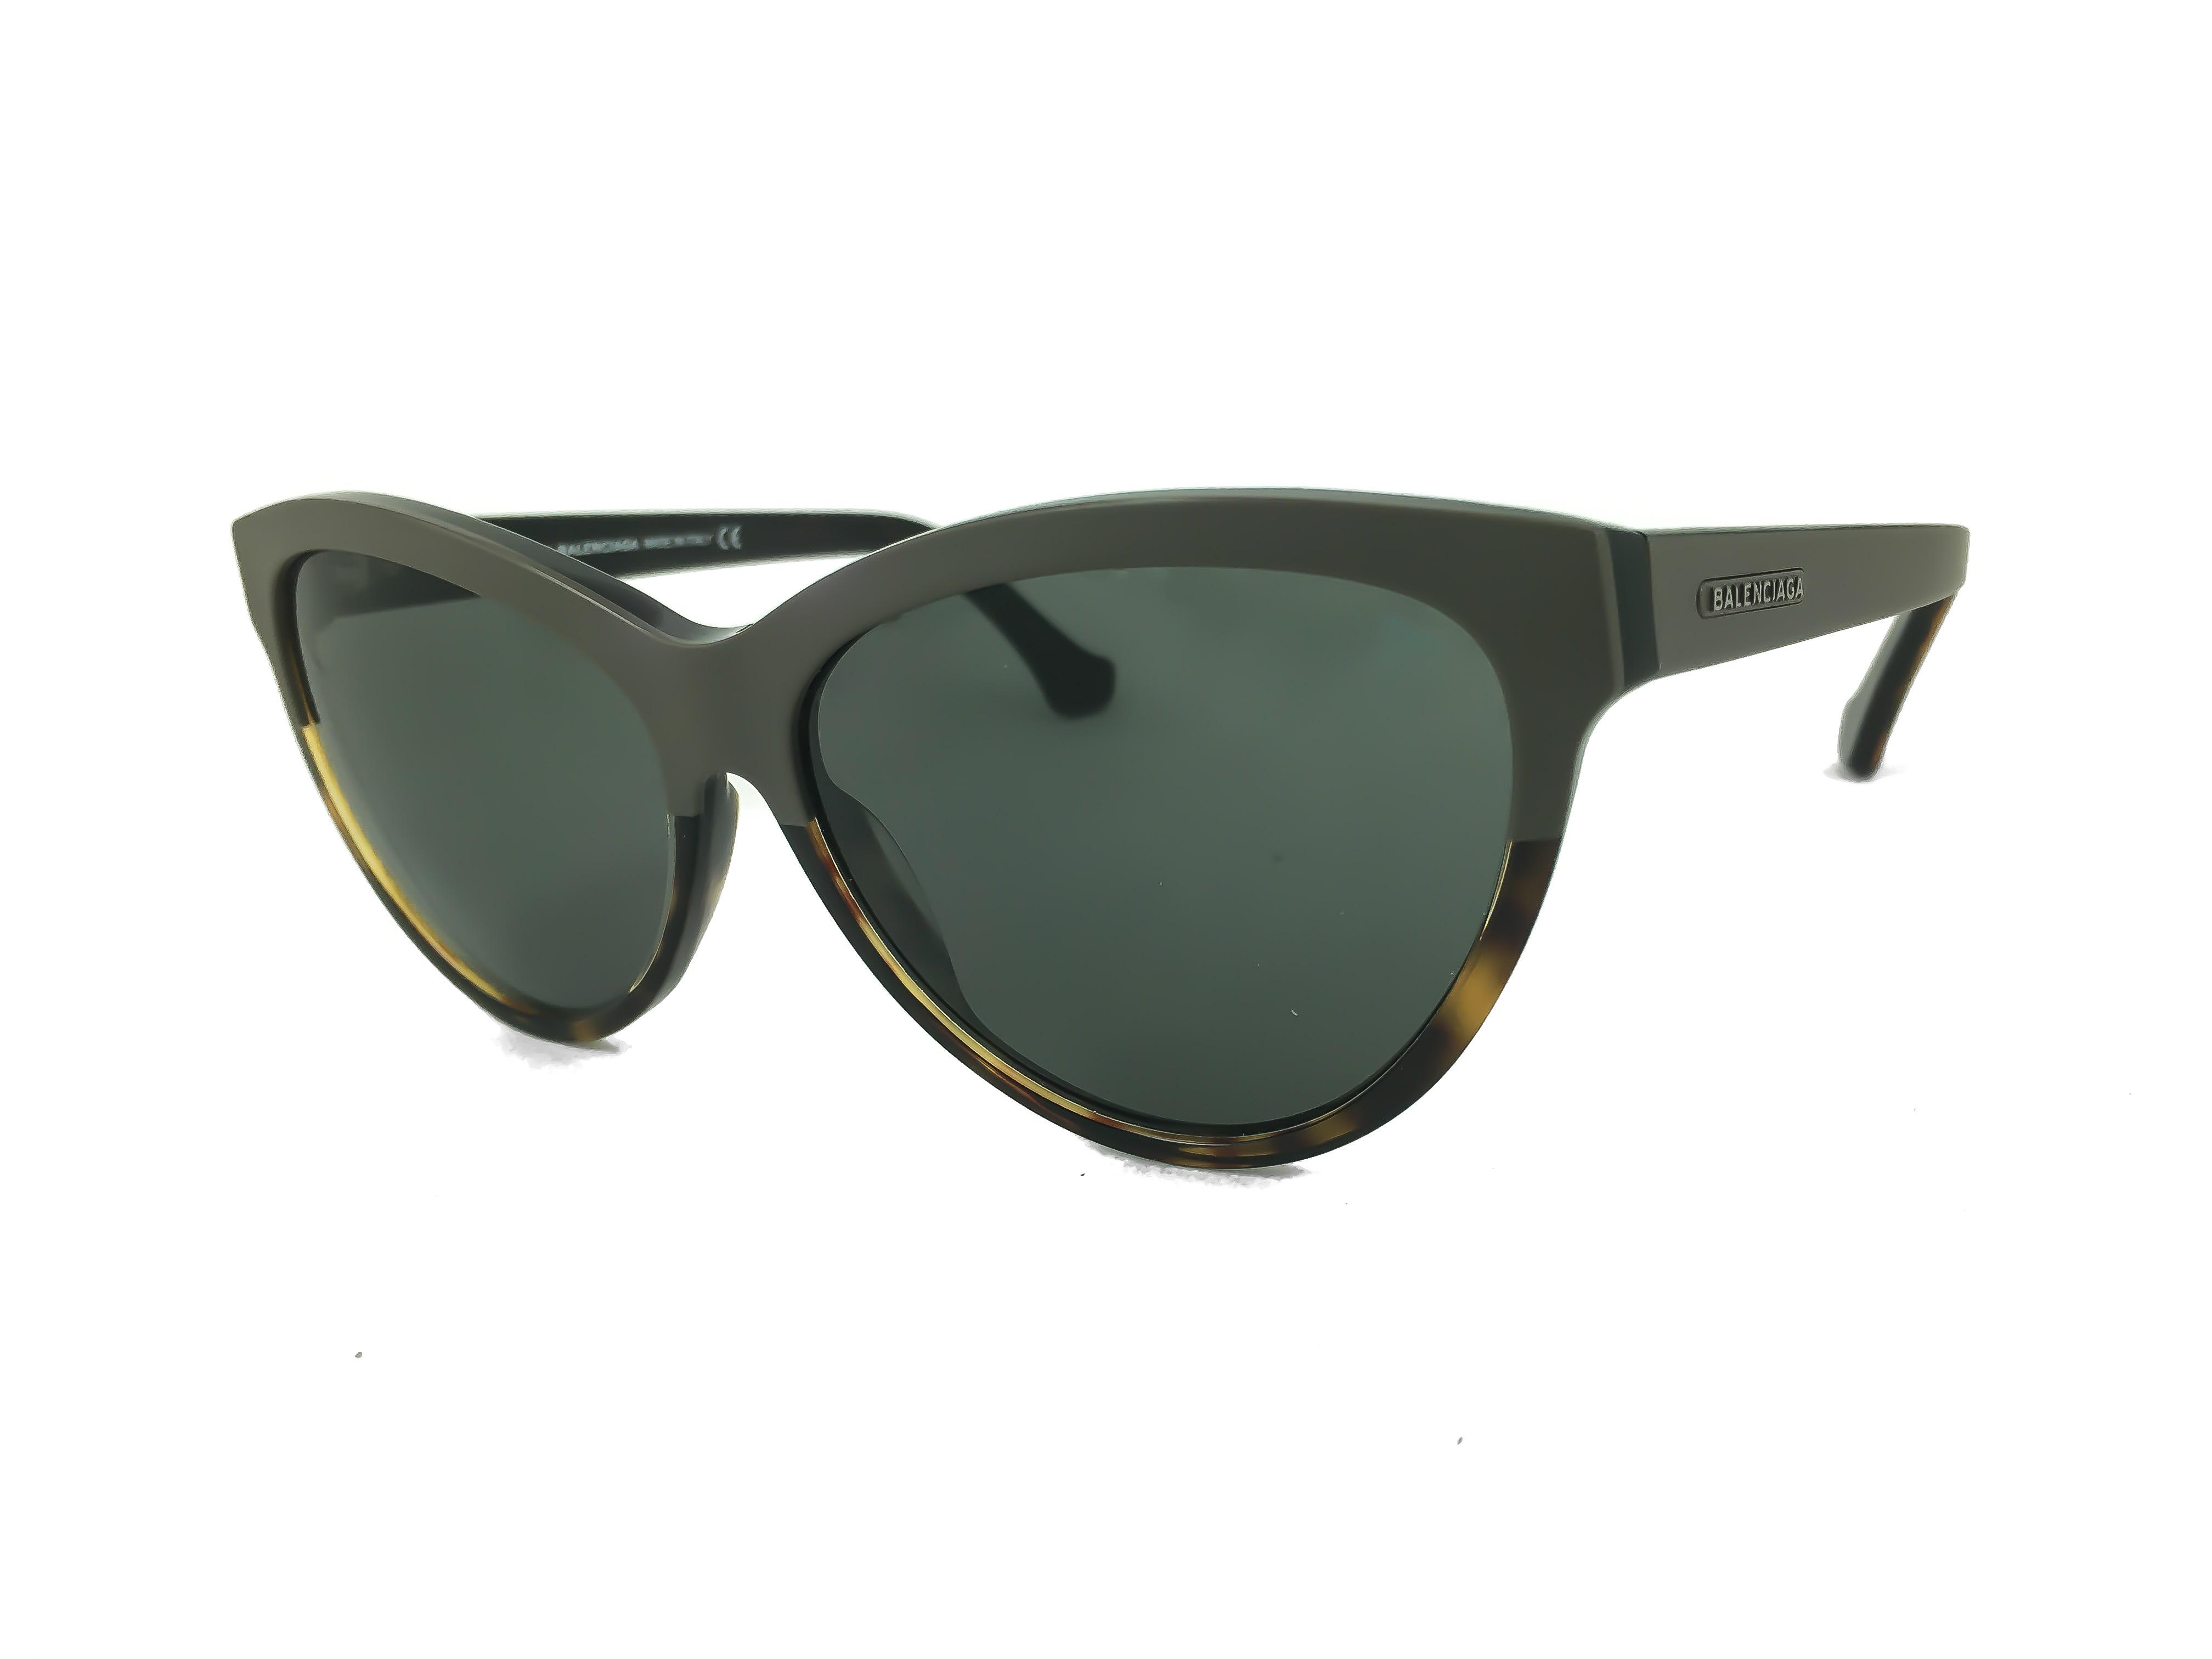 d8968eb5cc Τα γυαλιά ηλίου BALENCIAGA BA 0029 20A έχουν σχήμα πεταλούδας και  ταιριάζουν ιδανικά σε μεσαία πρόσωπα. Οι φακοί είναι οργανικοί